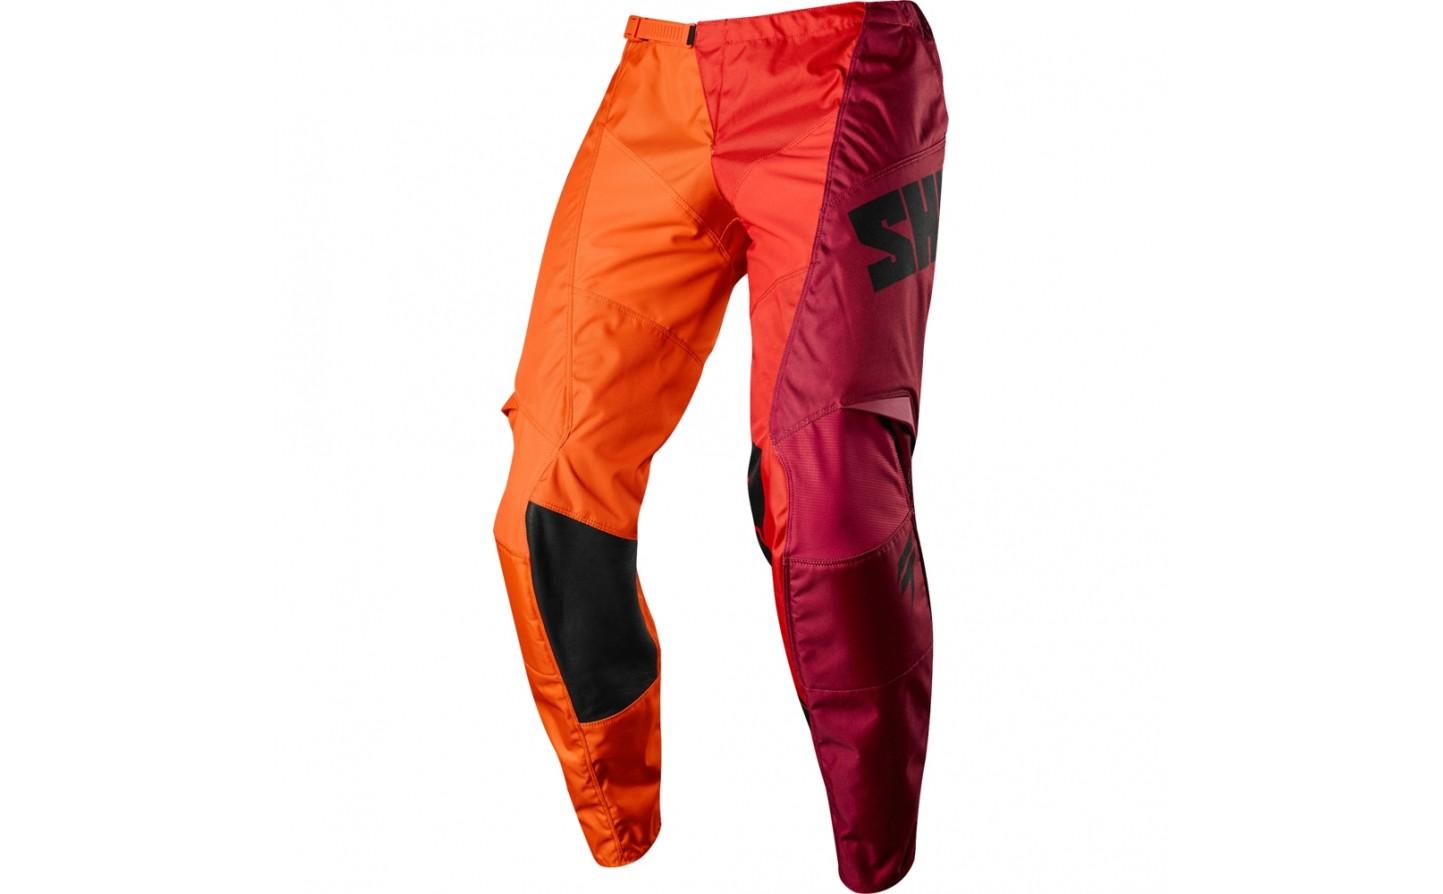 pantalon shift label whit3 tarmac naranja talle 30